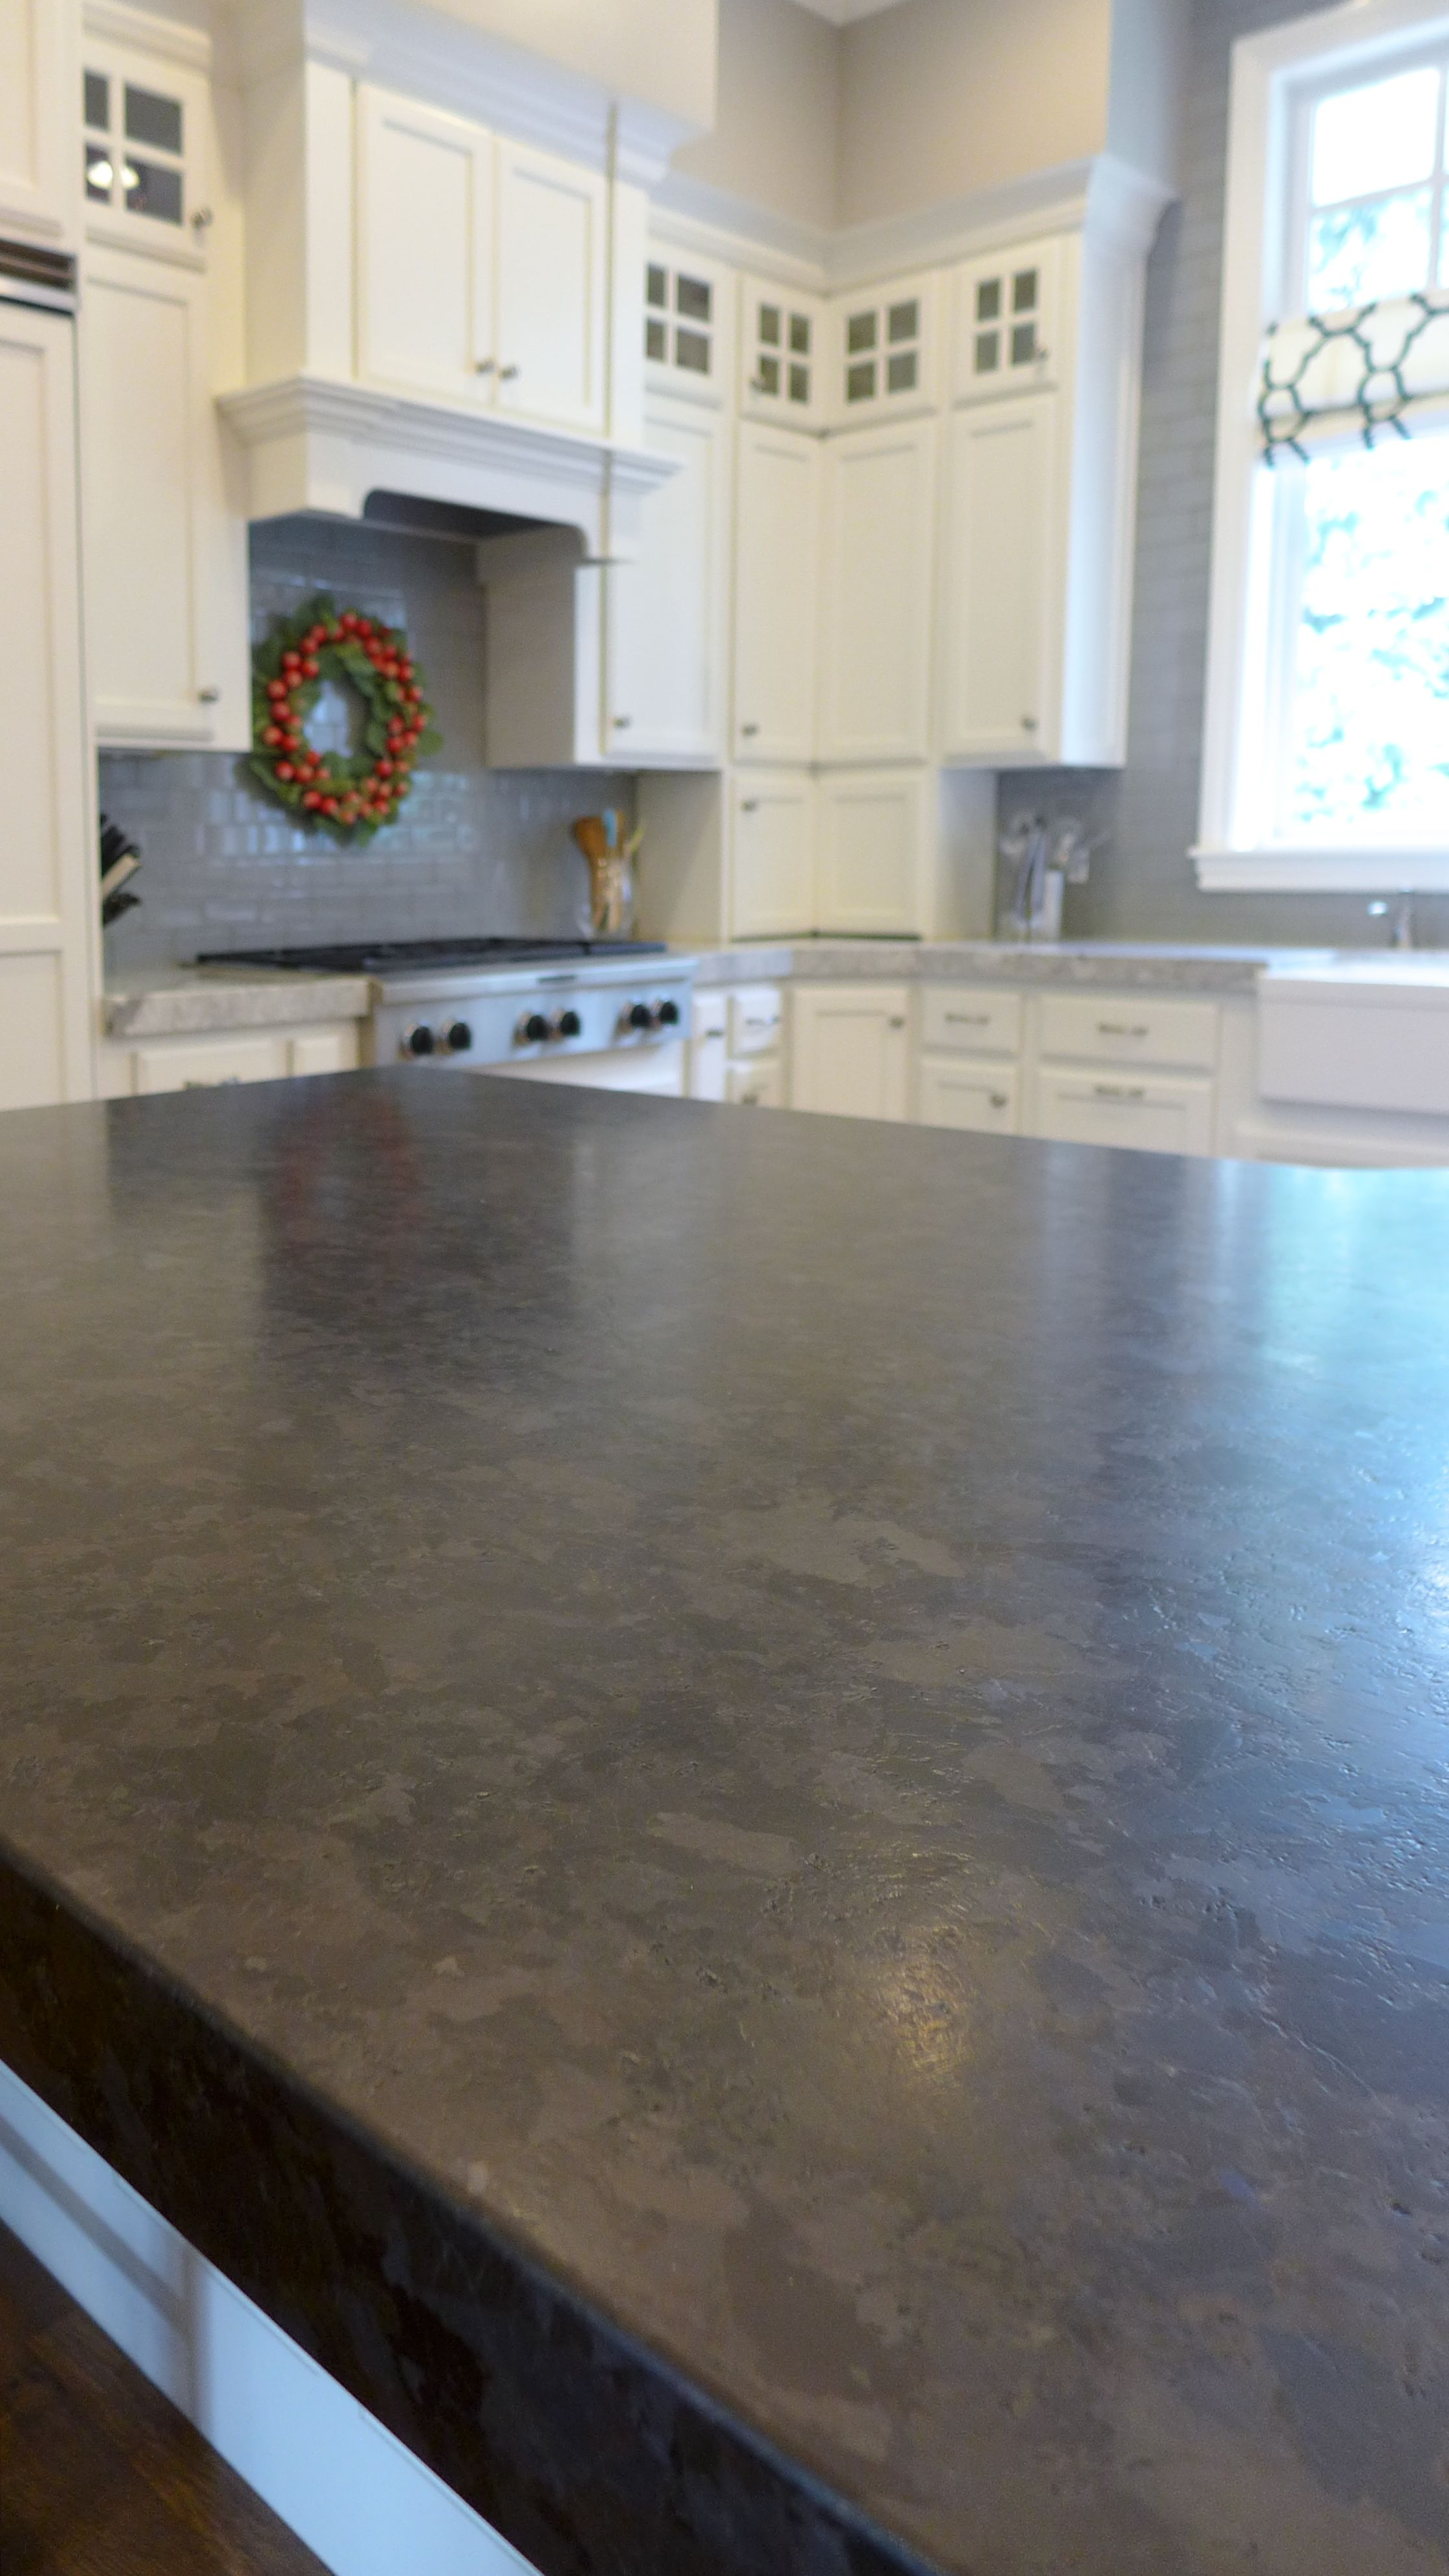 Contemporary Marron Cohiba Granite Kitchen Island Granite Countertops Countertops Kitchen And Bath Remodeling